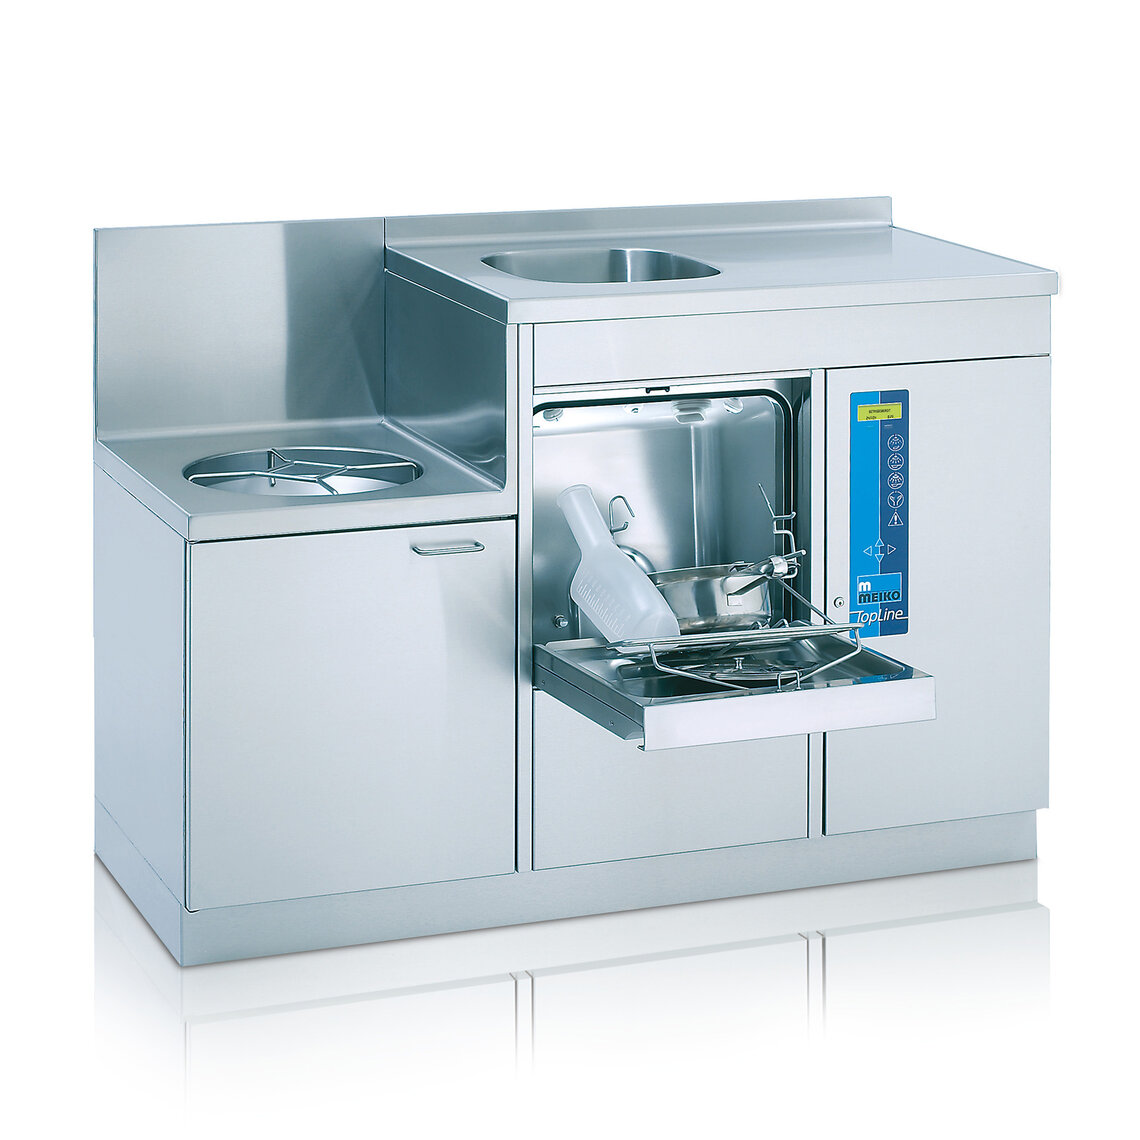 Combined Sluice Units For Hospital Hygiene Meiko